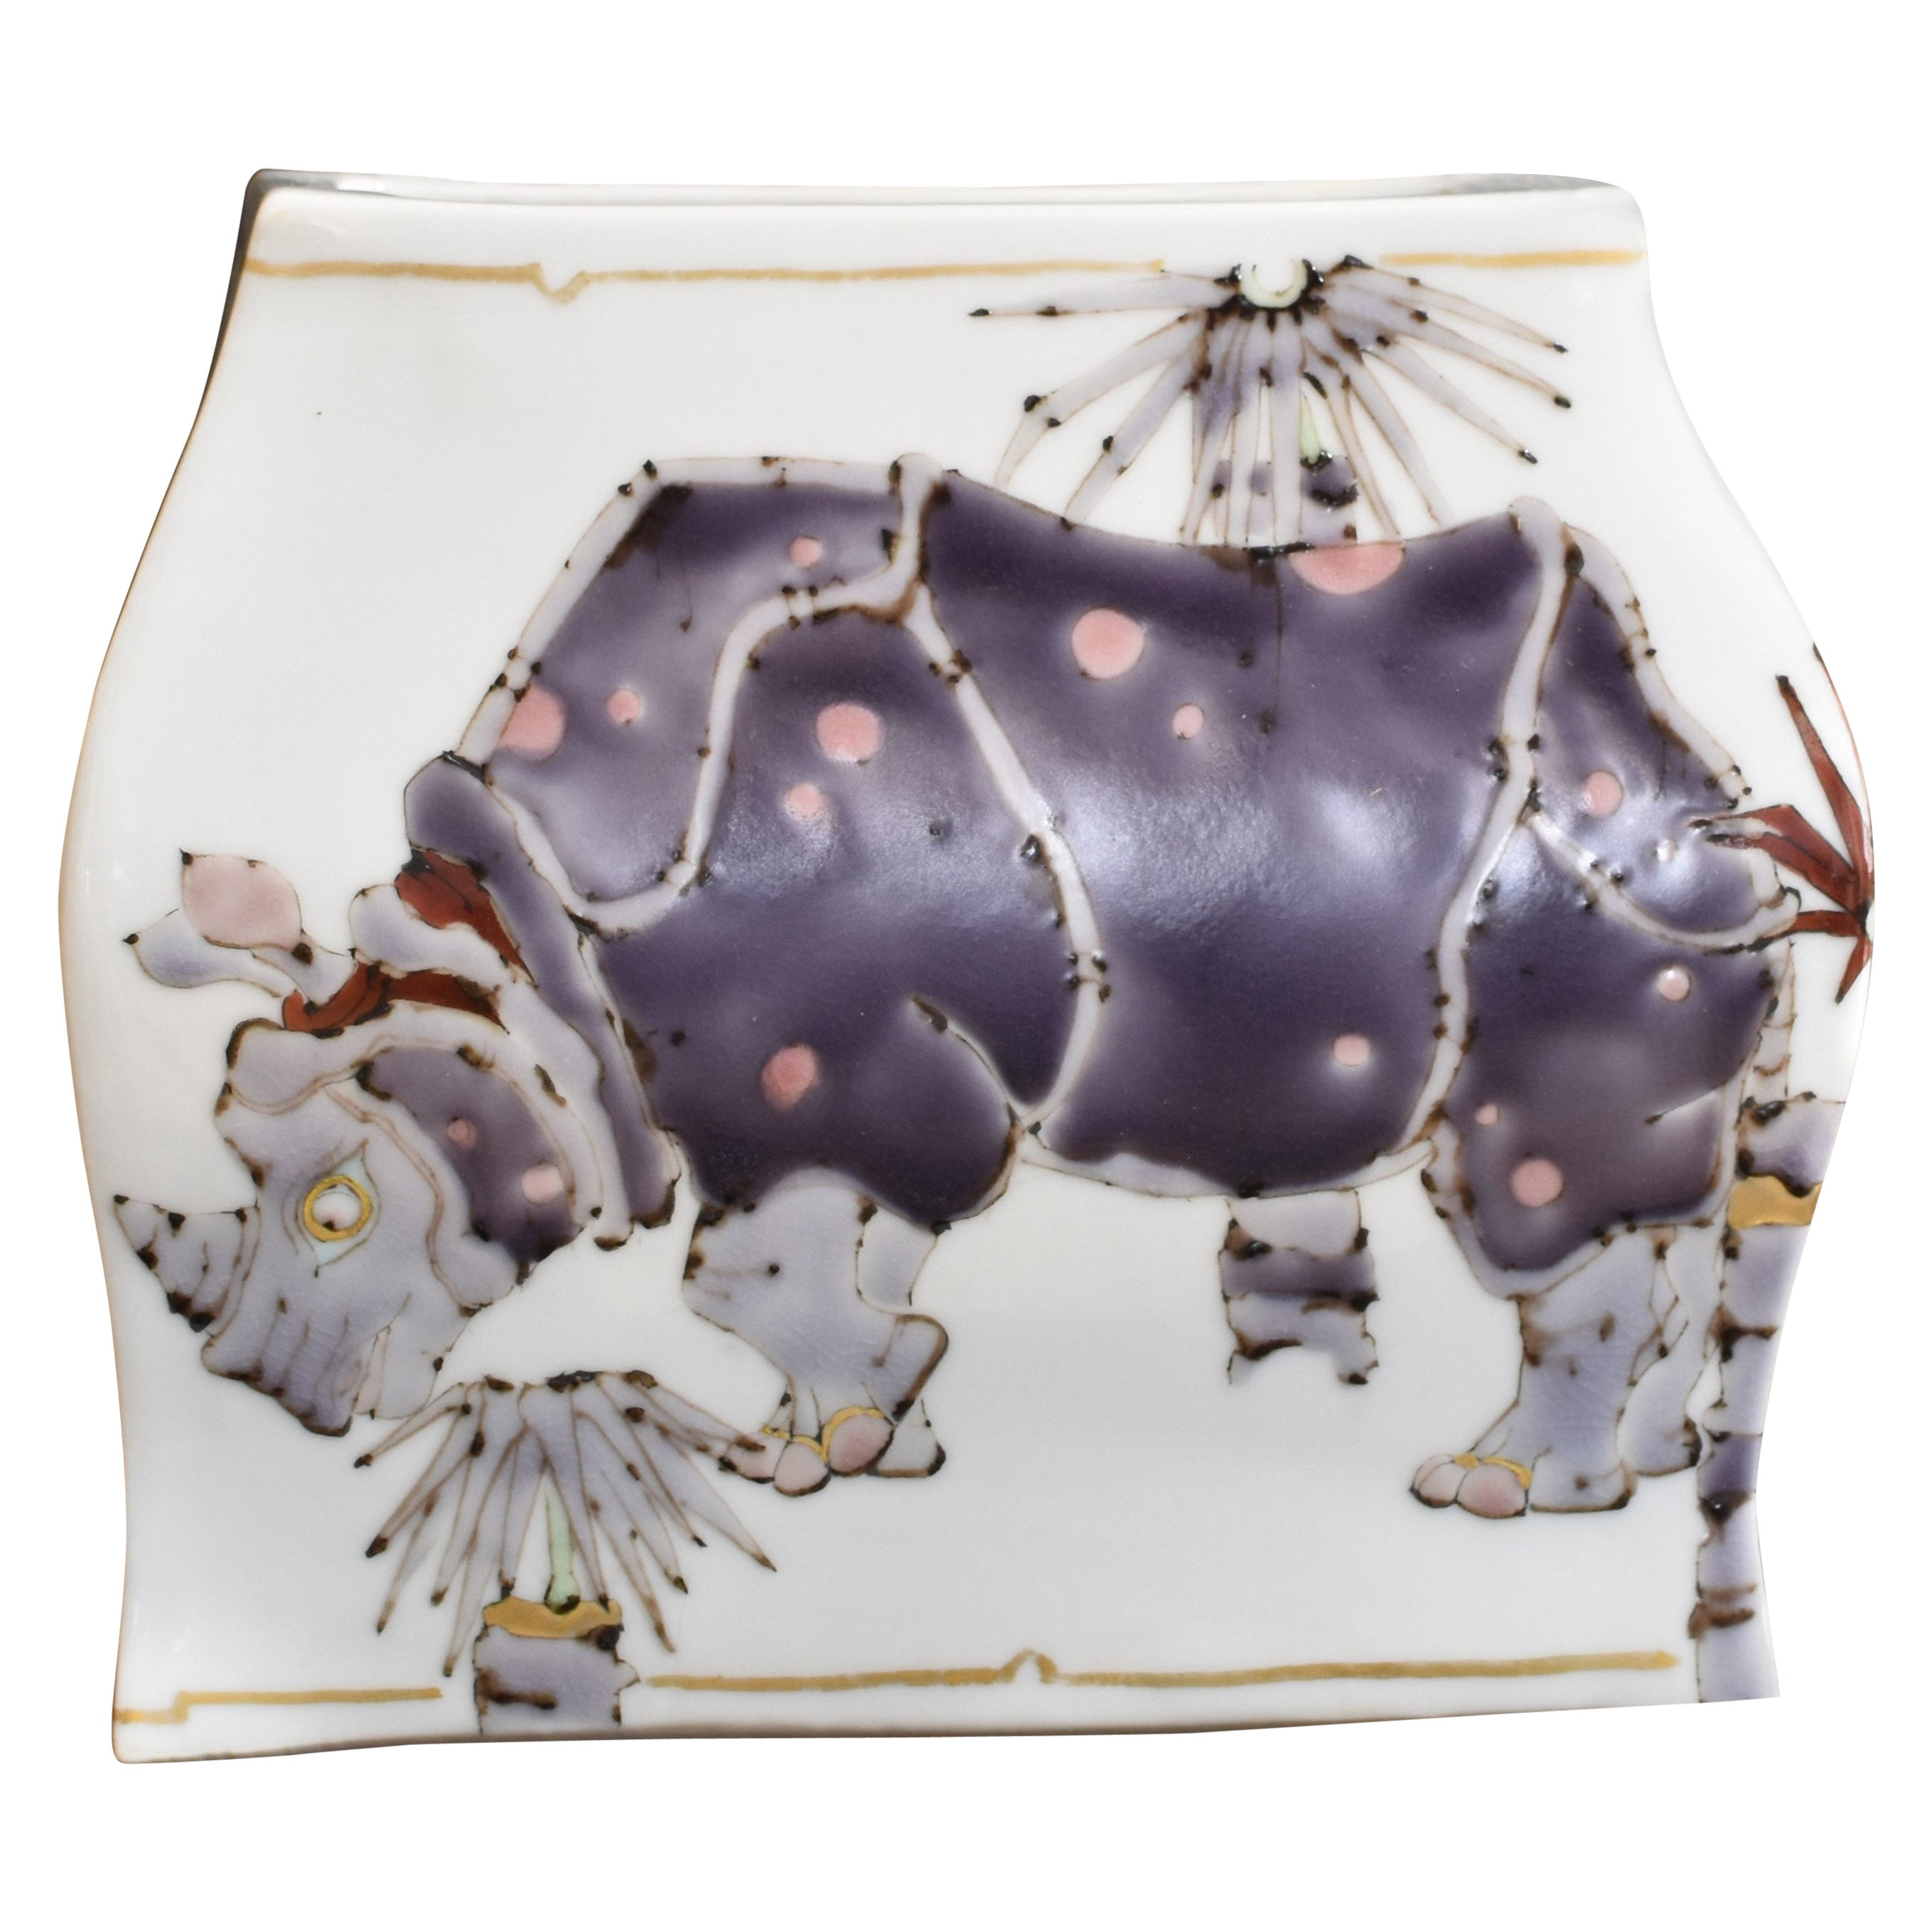 Japanese Kutani Hand Painted Porcelain Vase by Contemporary Master Artist